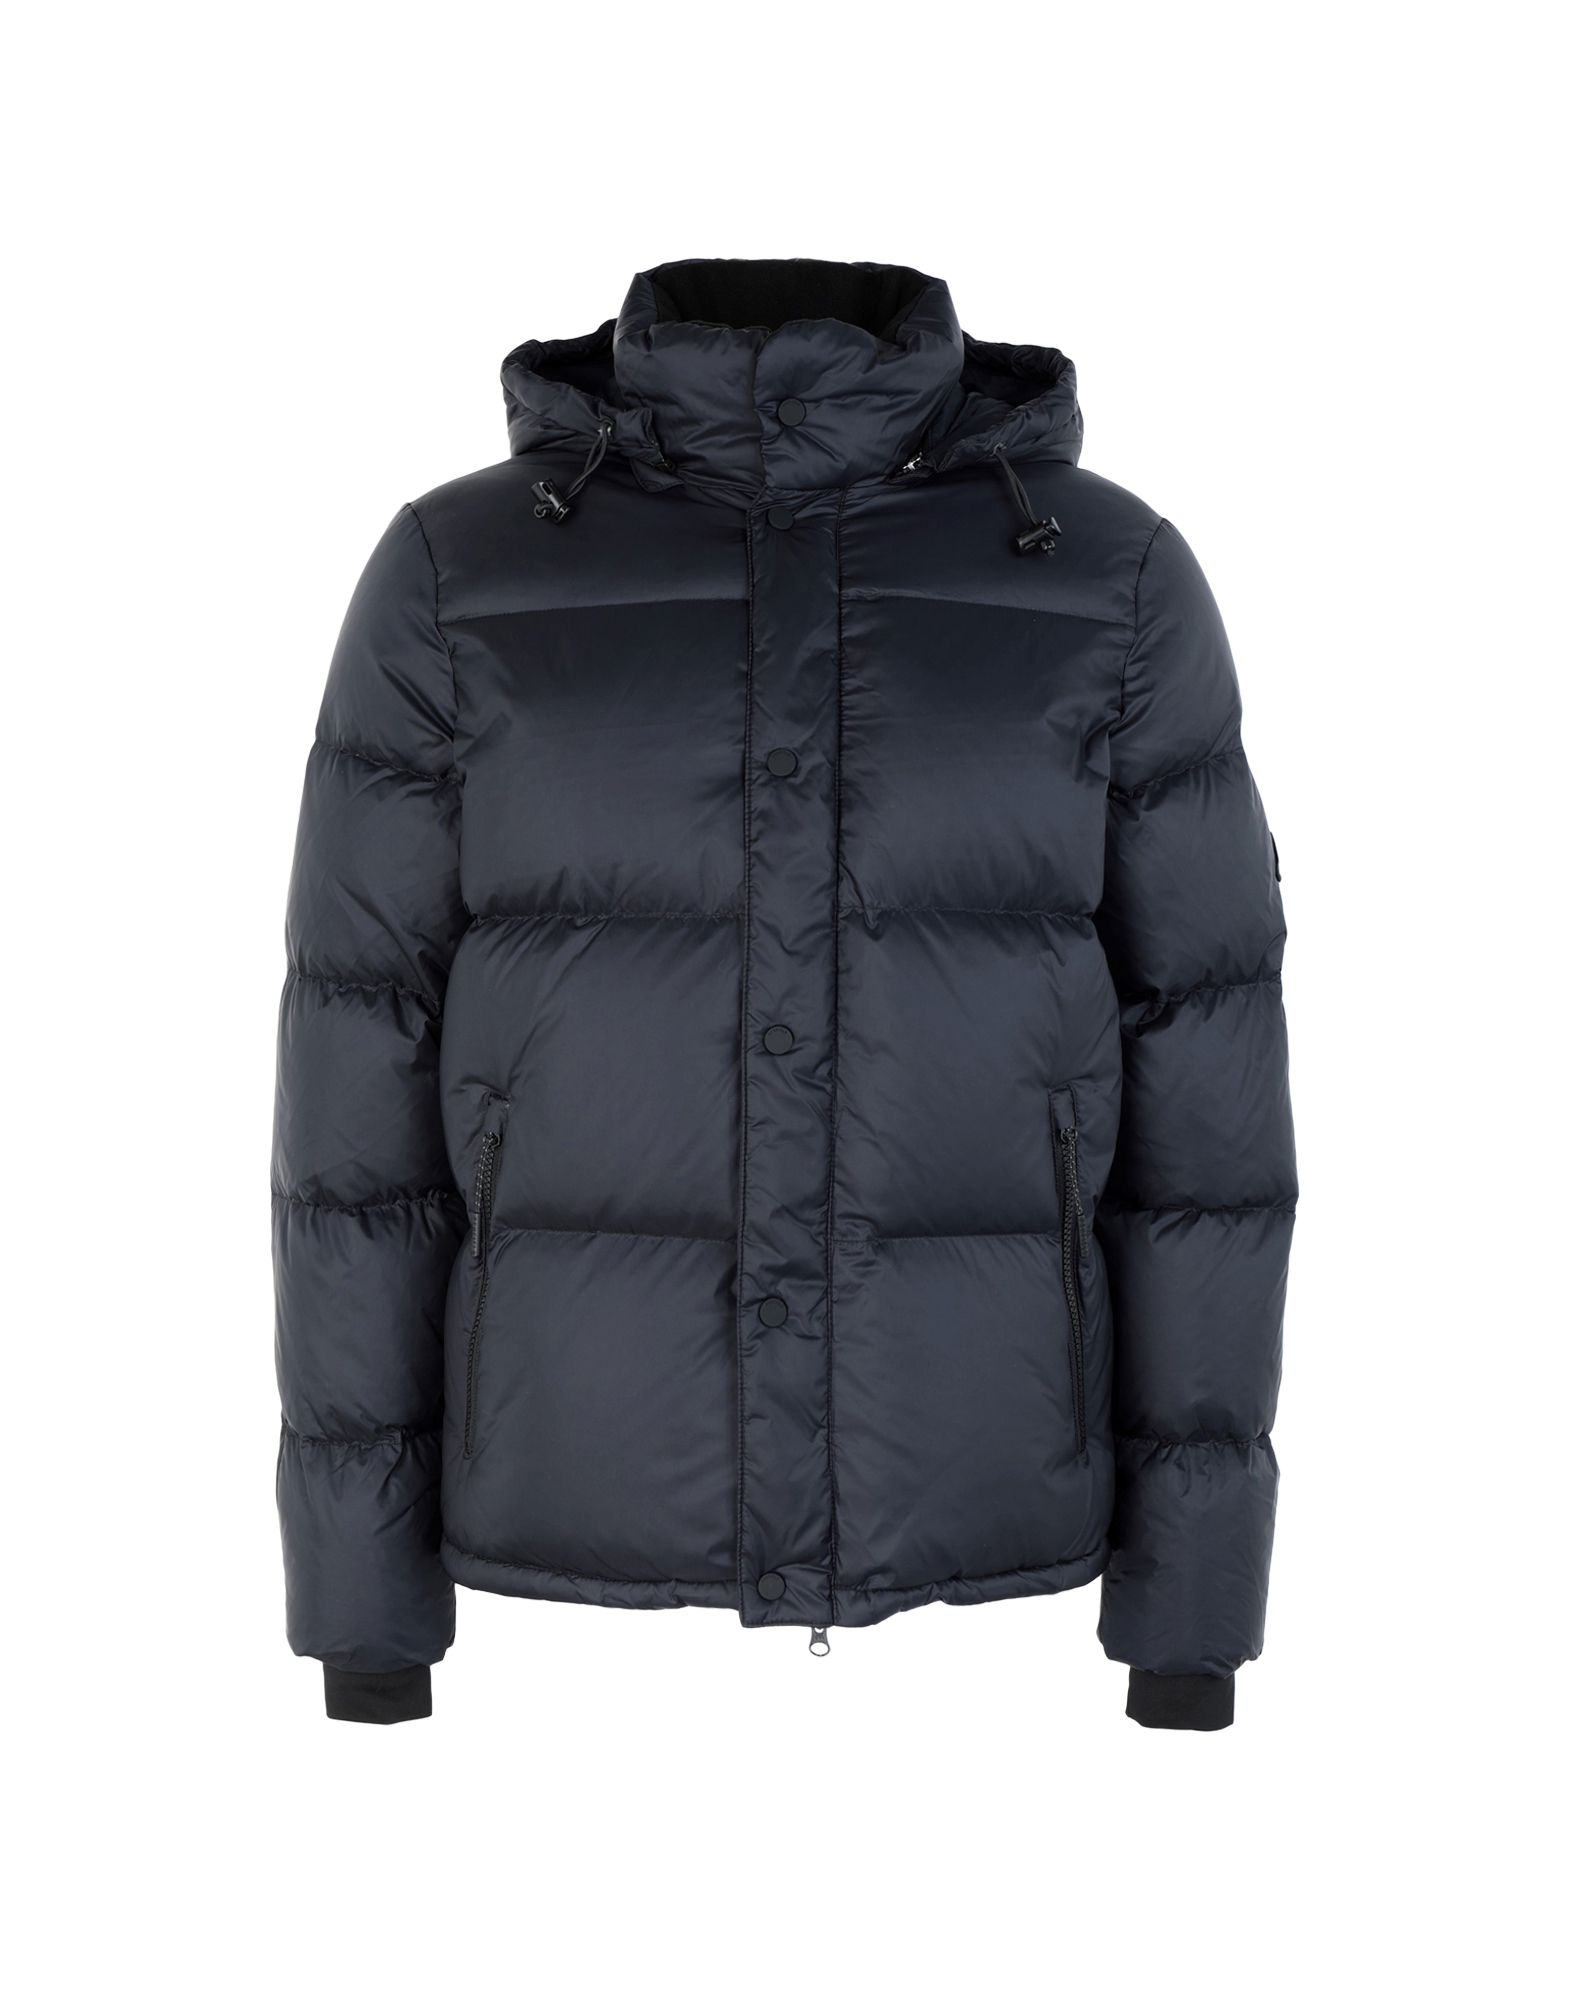 YOOX.COM(ユークス)《セール開催中》PENFIELD メンズ 合成繊維中綿アウター ブラック M ナイロン 100%